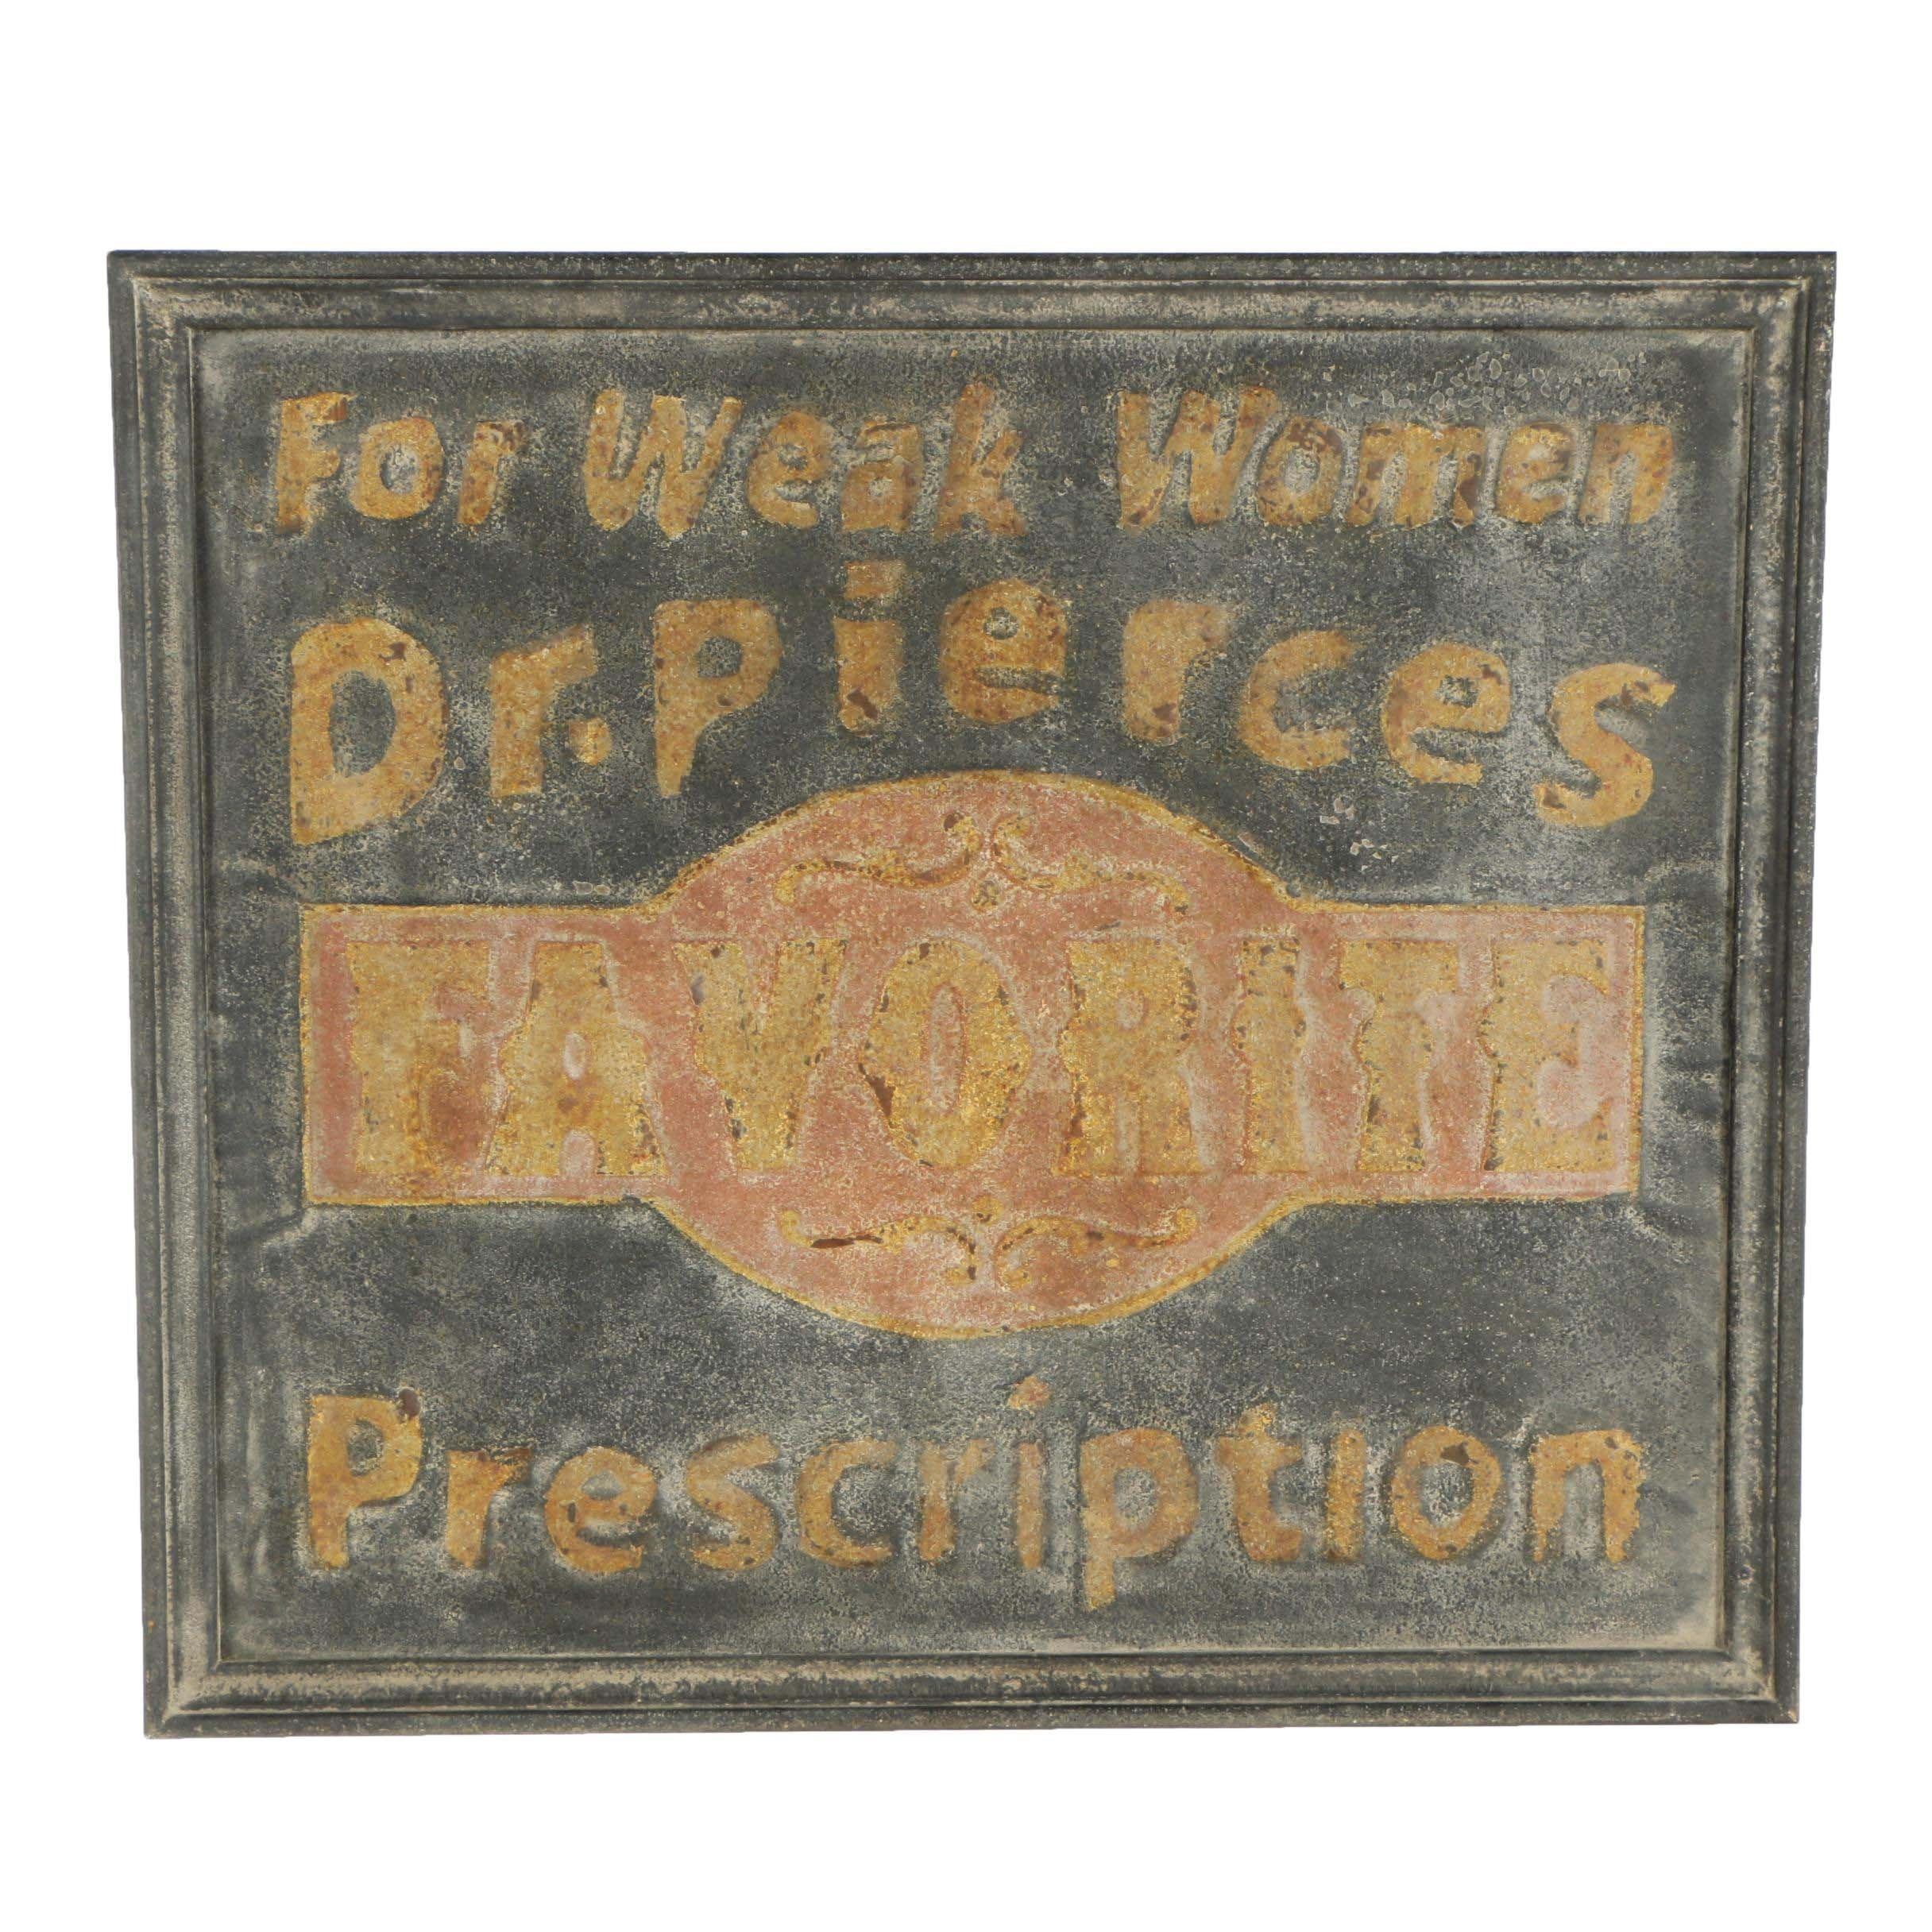 Rusticated Metal Druggist Sign